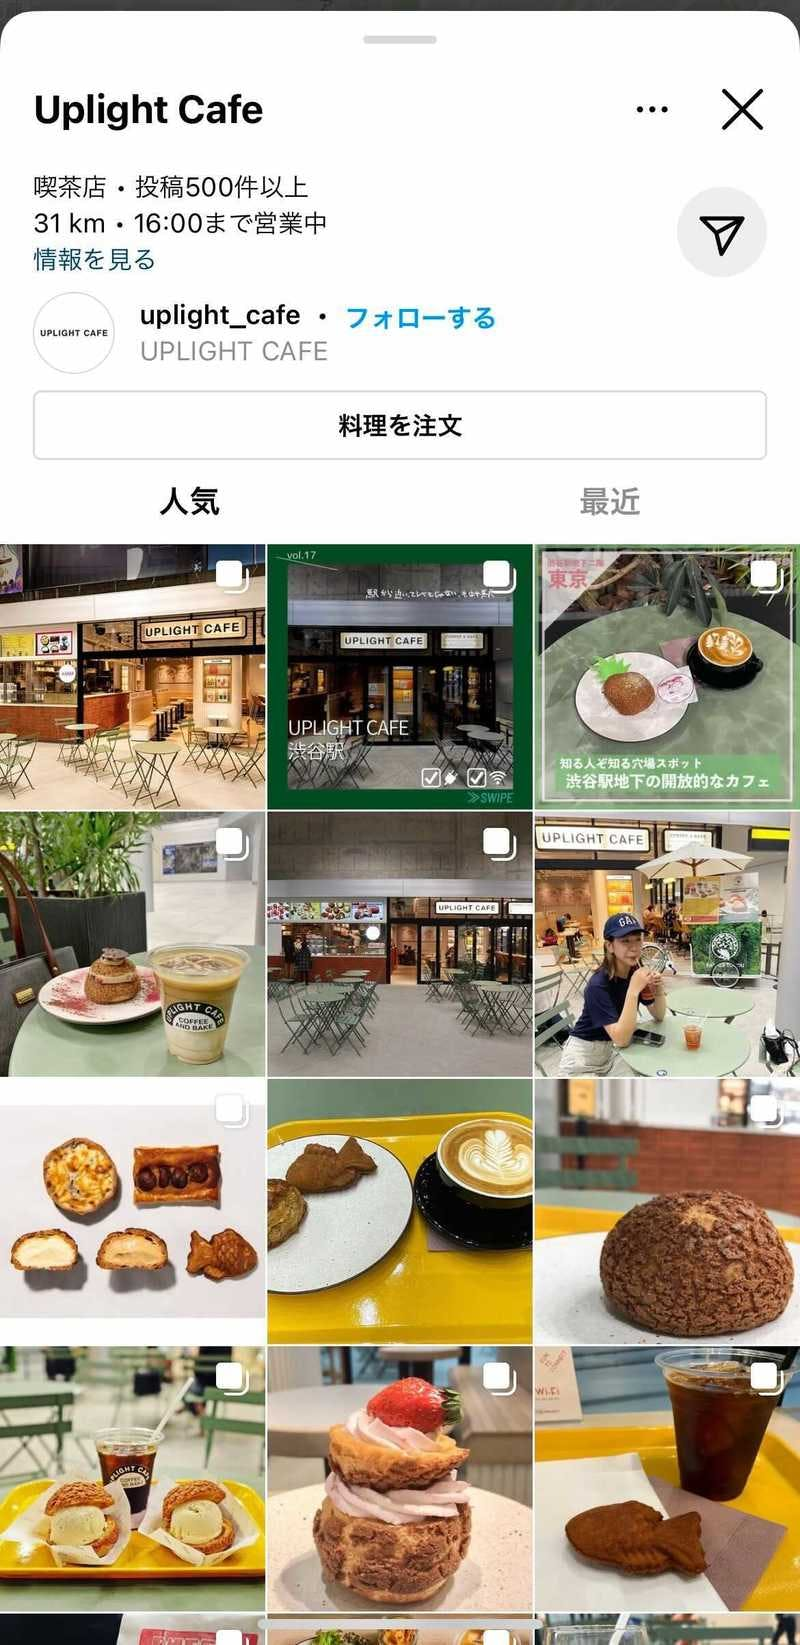 Instagramの地図検索で表示される店舗情報